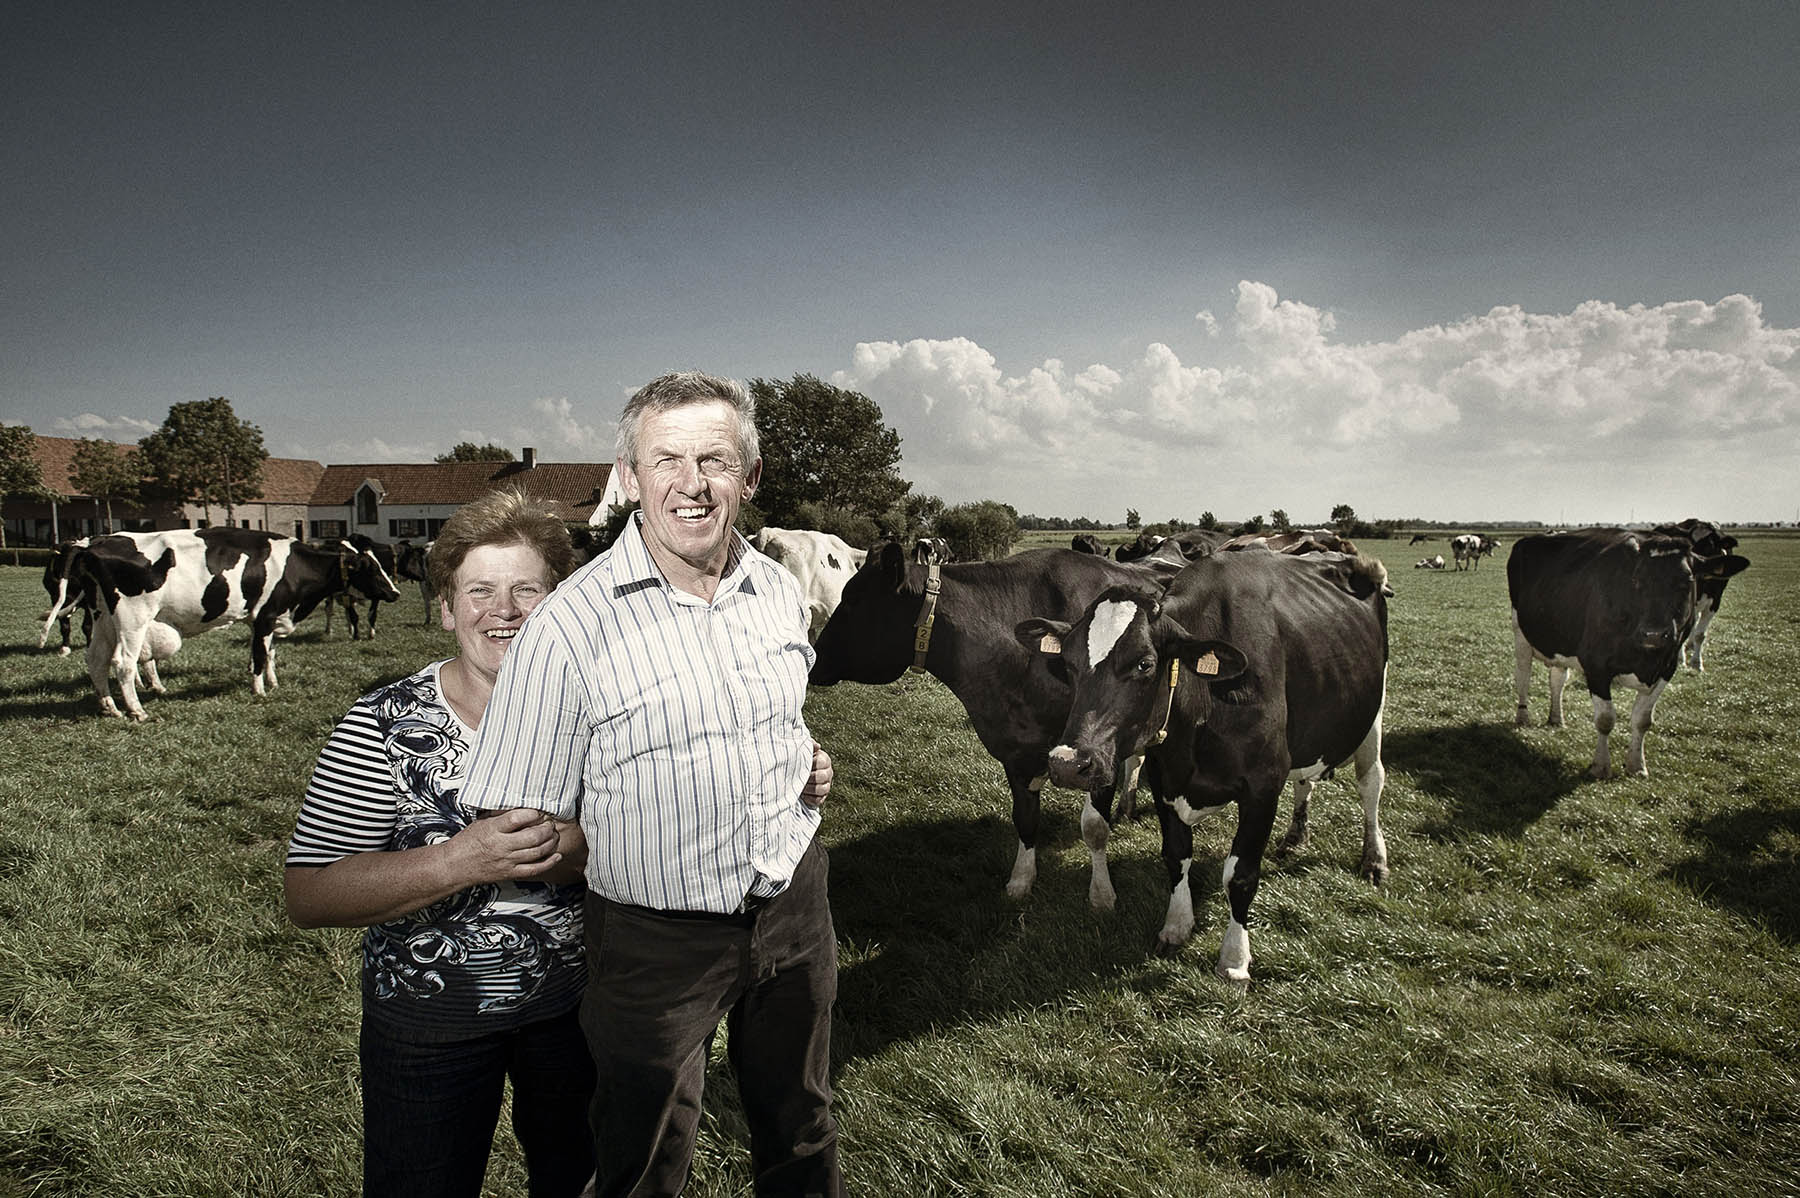 Kurt Vansteelant _ Series Milk Farmers _ 01.jpg